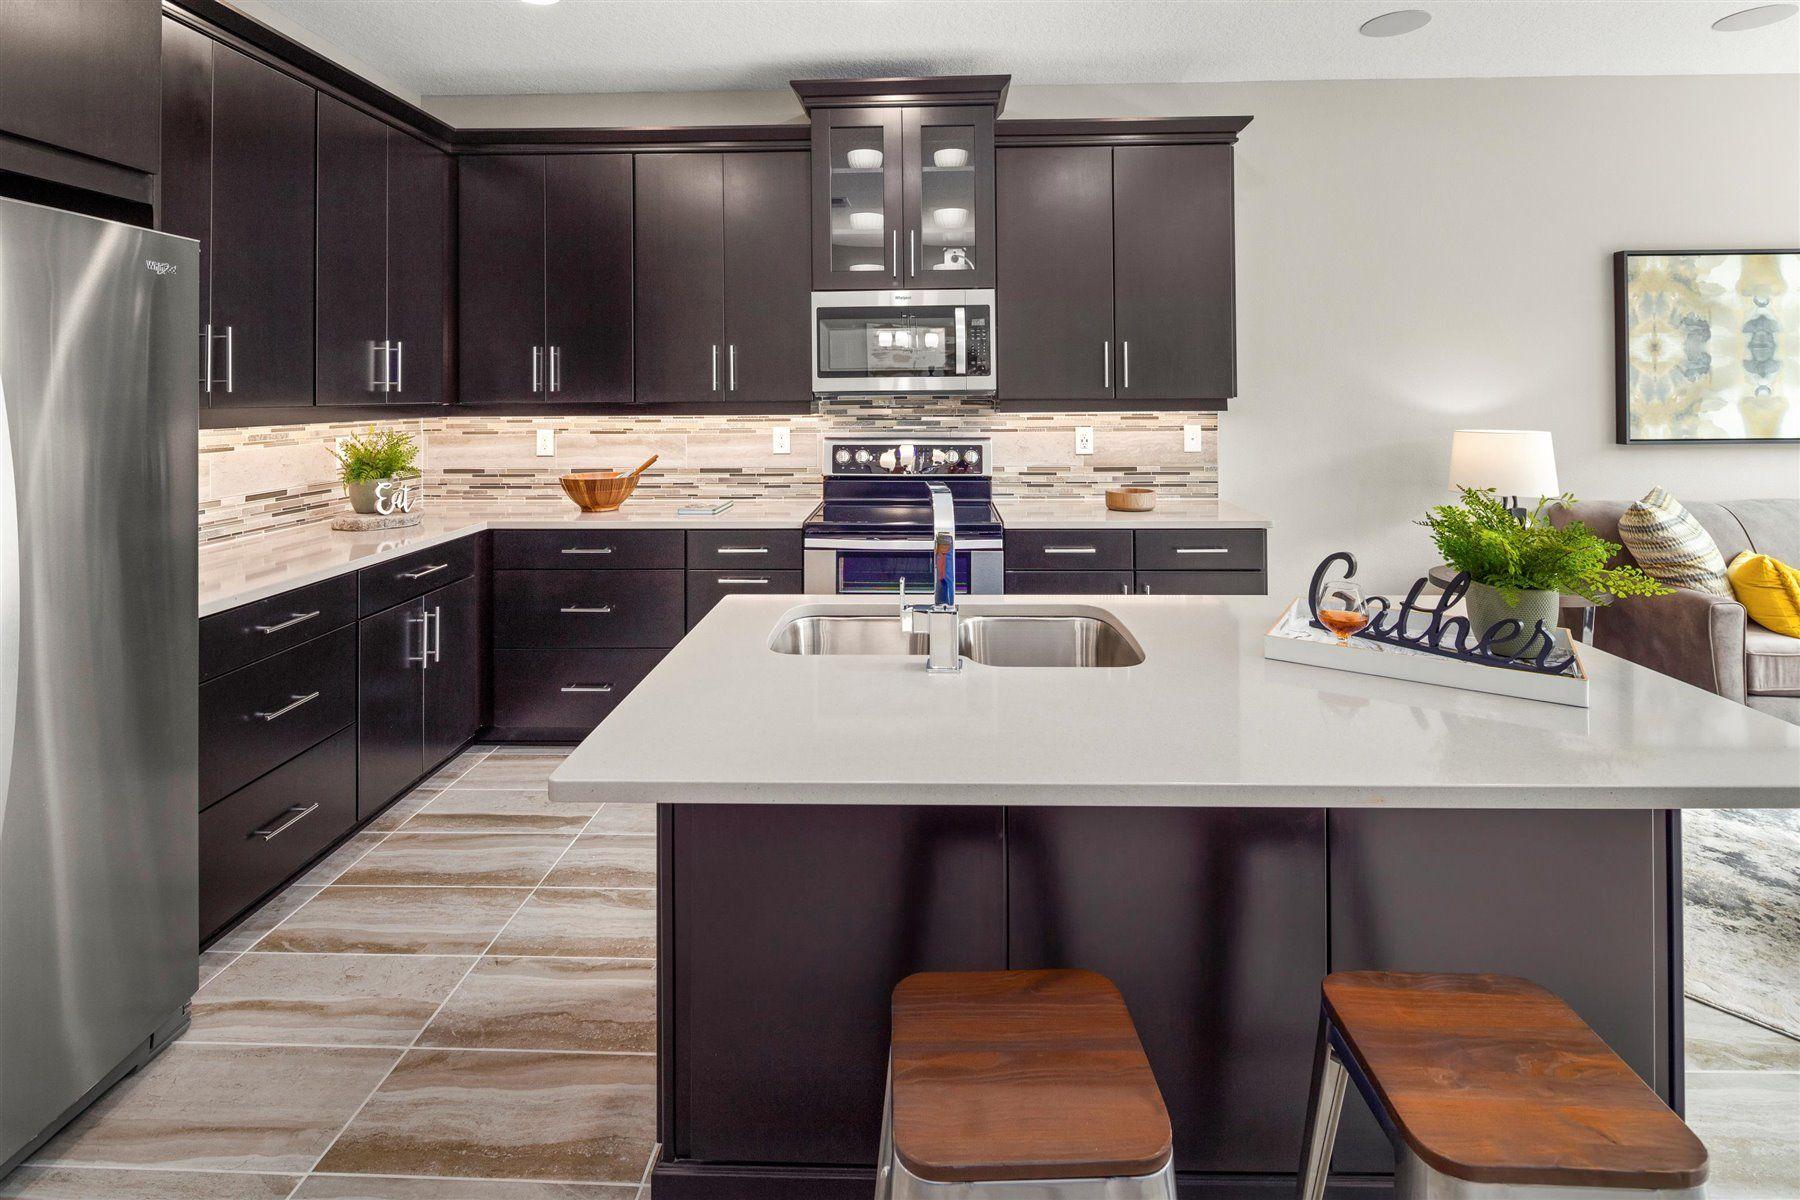 Kitchen featured in the Barrington By Mattamy Homes in Orlando, FL